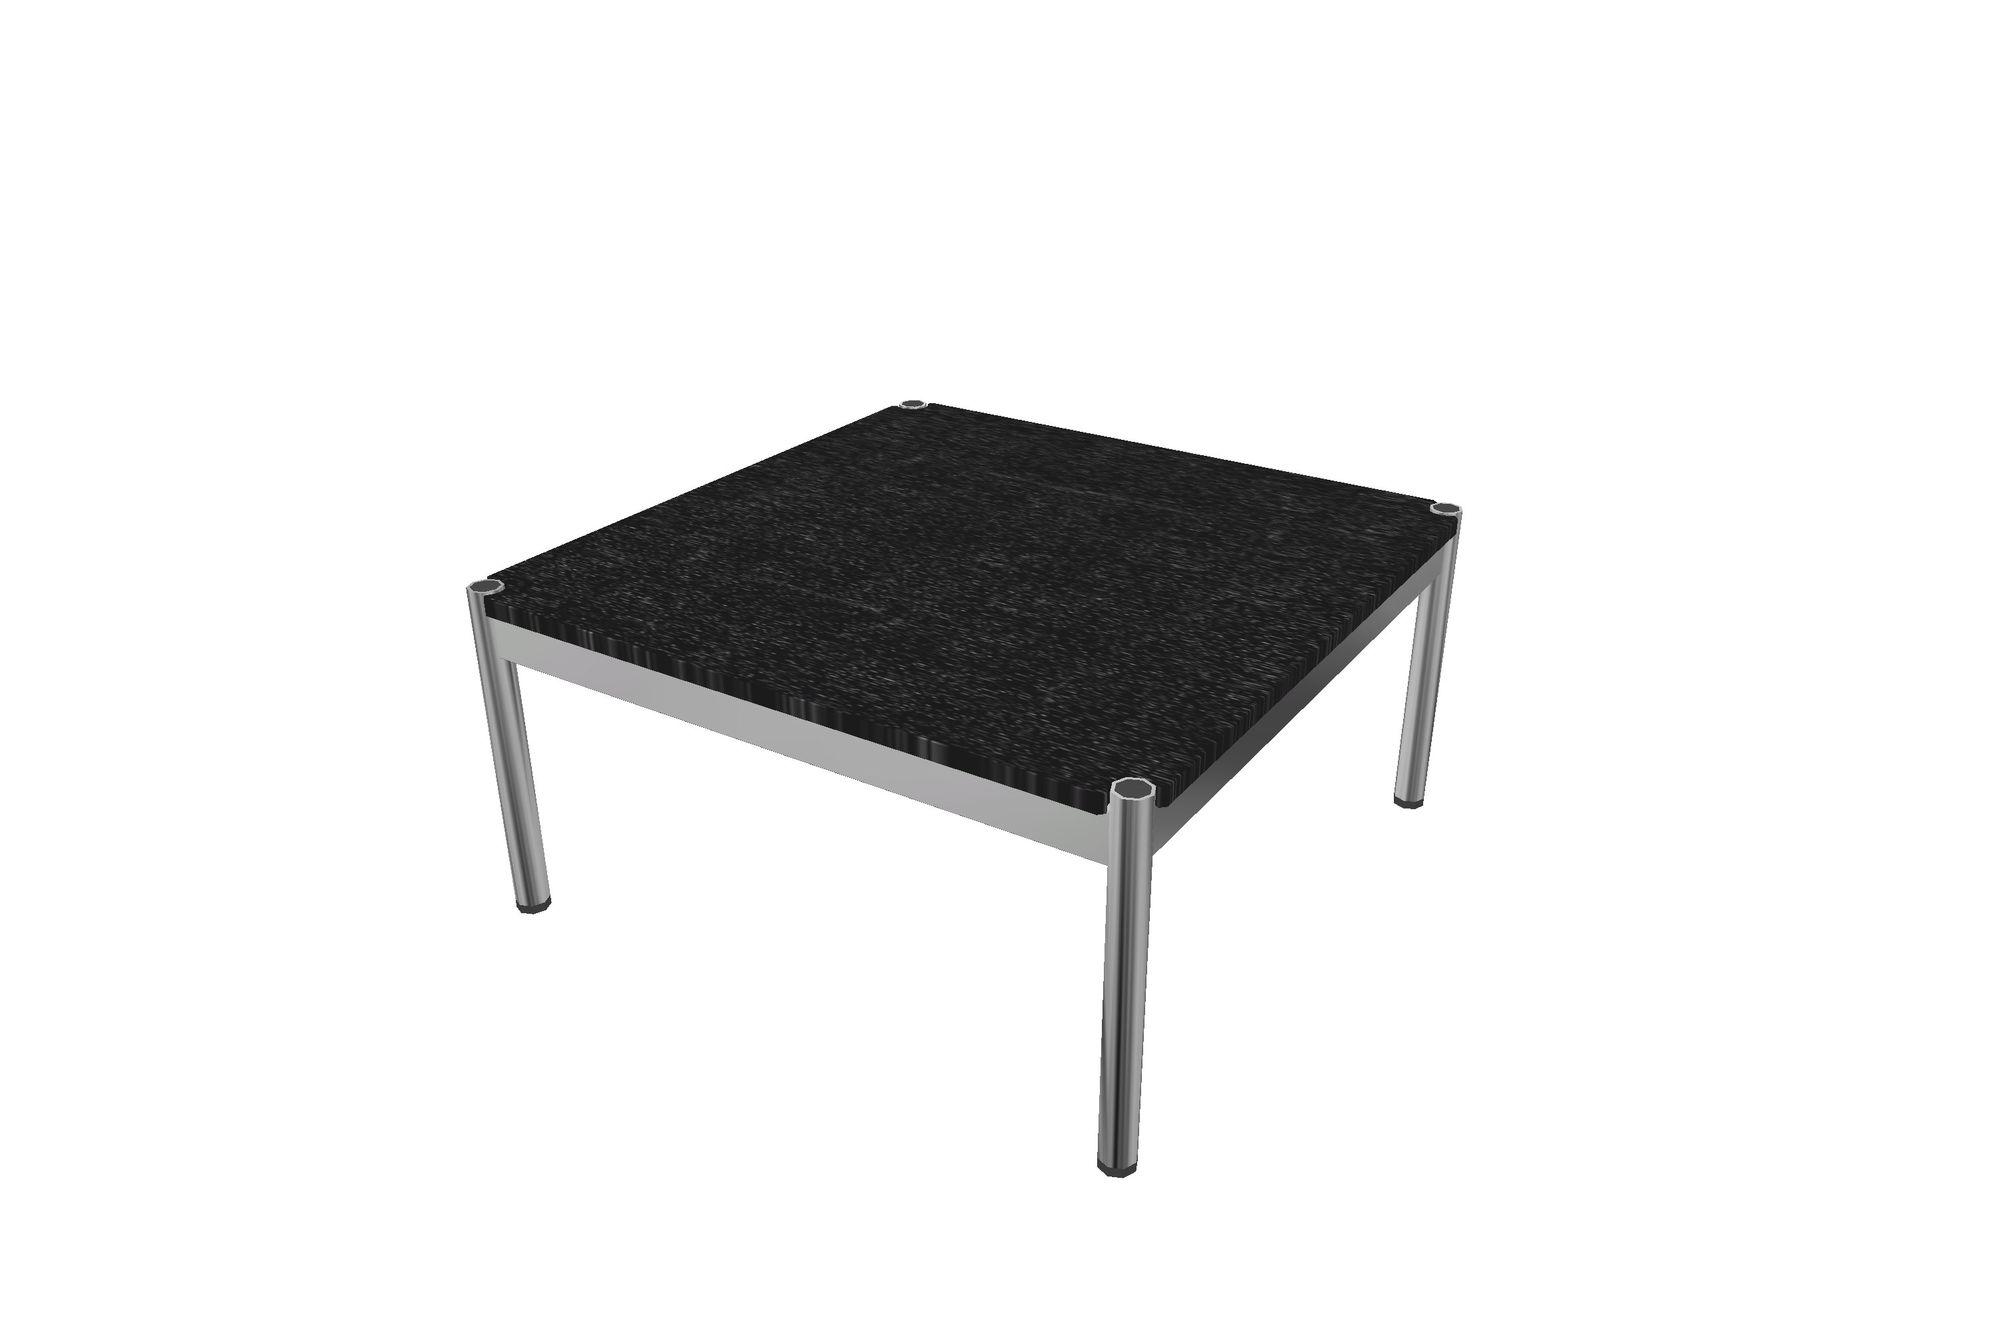 usm haller couchtisch 750 x 750. Black Bedroom Furniture Sets. Home Design Ideas